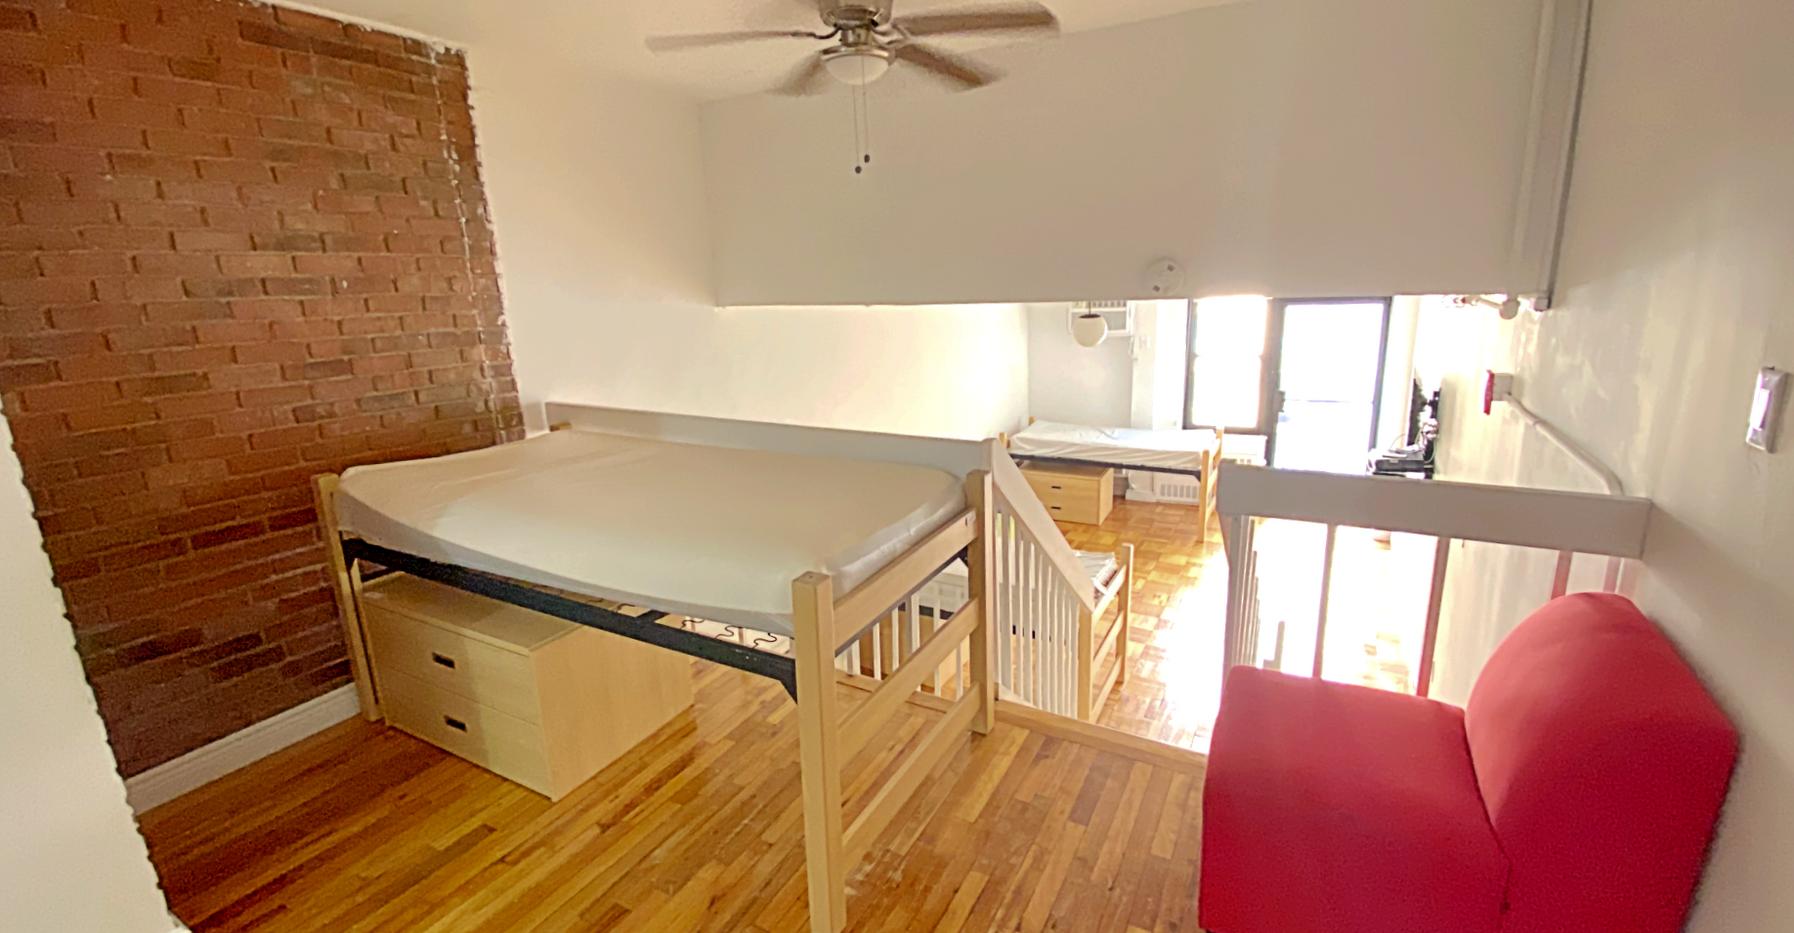 New York student housing room 5